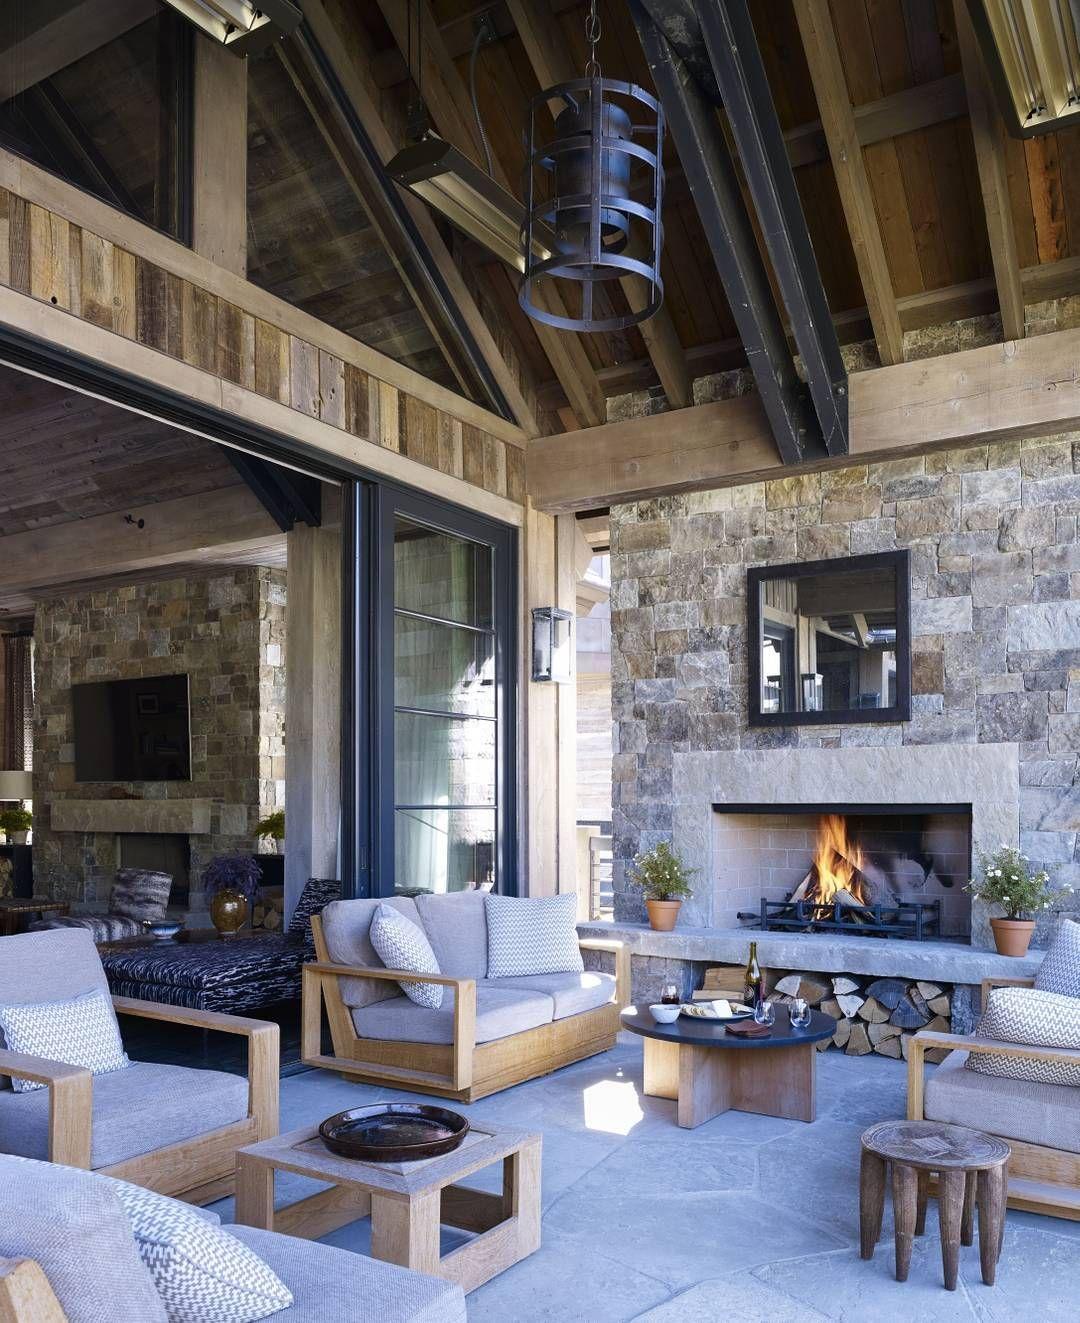 20 Instagram Home Design Ideas   20 Best Rooms On Instagram